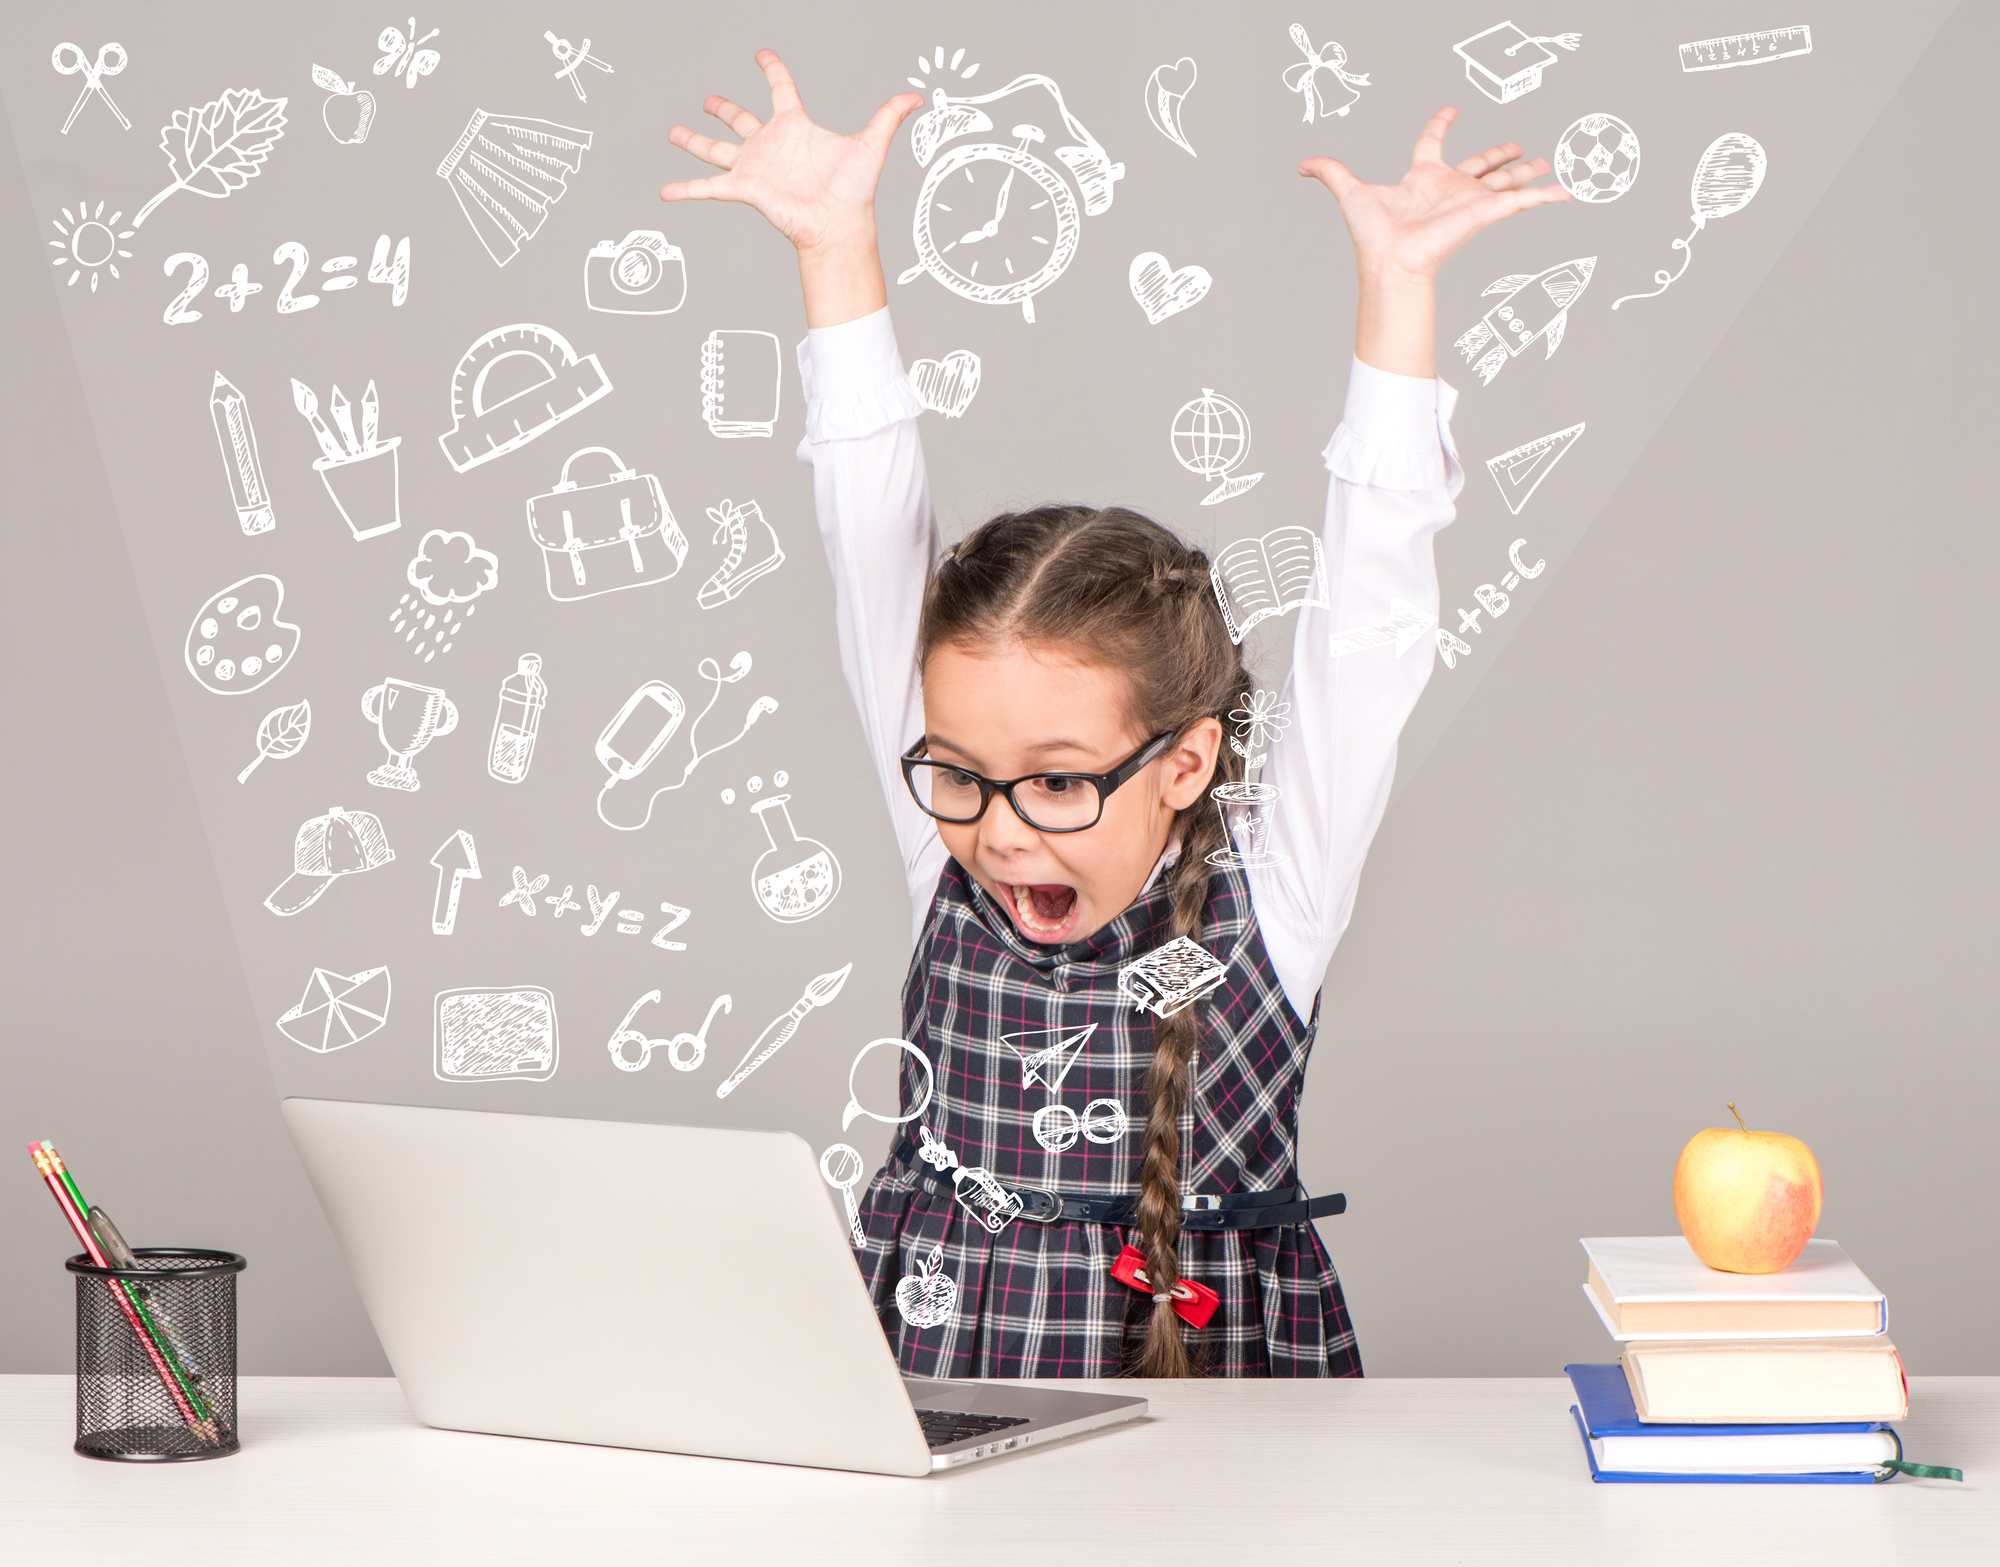 School System Webinar